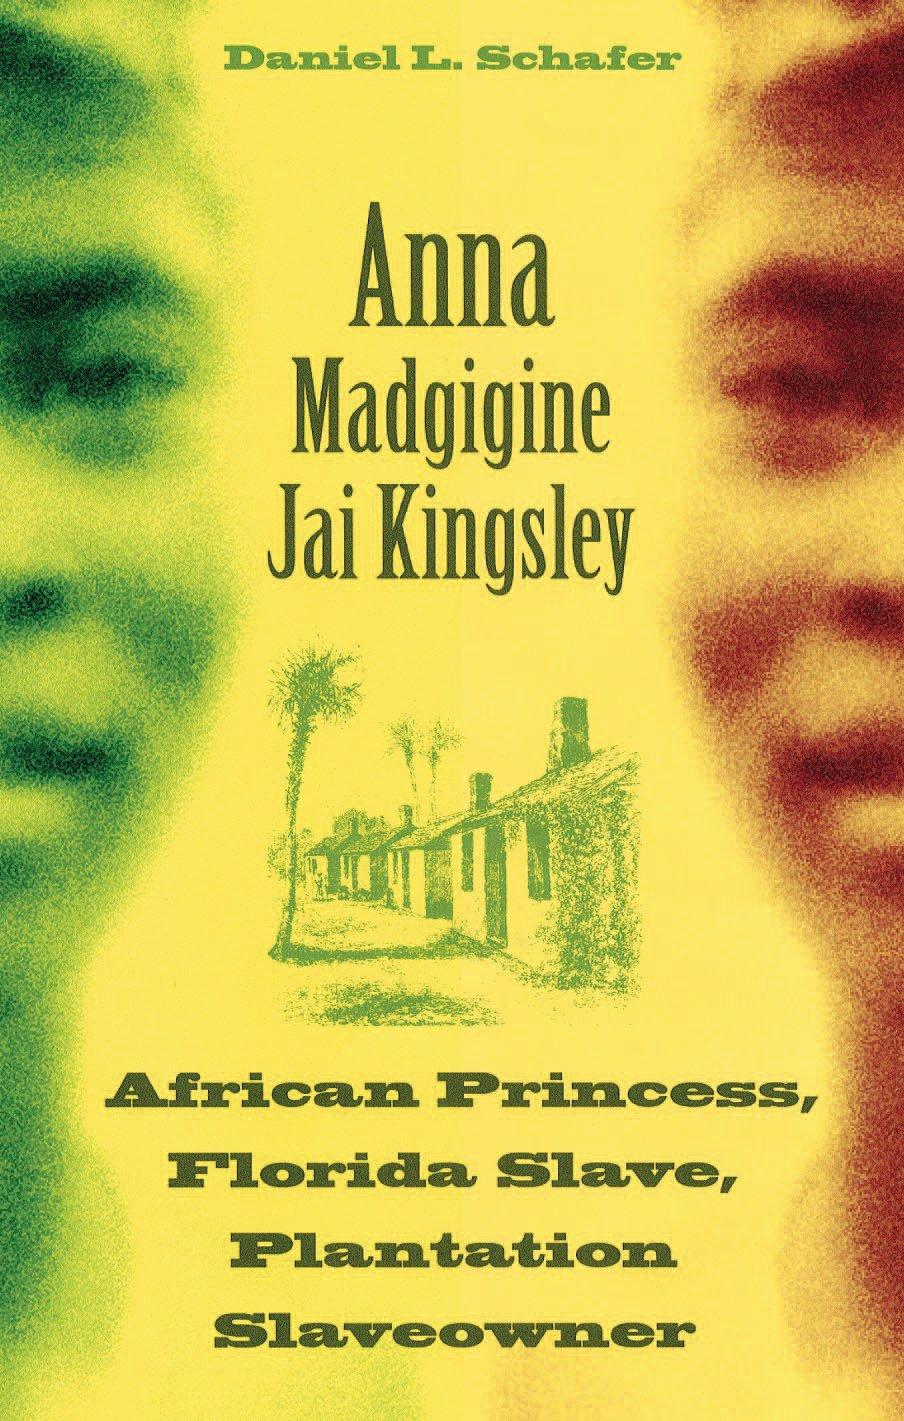 Anna Madgigine Jai Kingsley: African Princess, Florida Slave, Plantation Slaveowner ebook